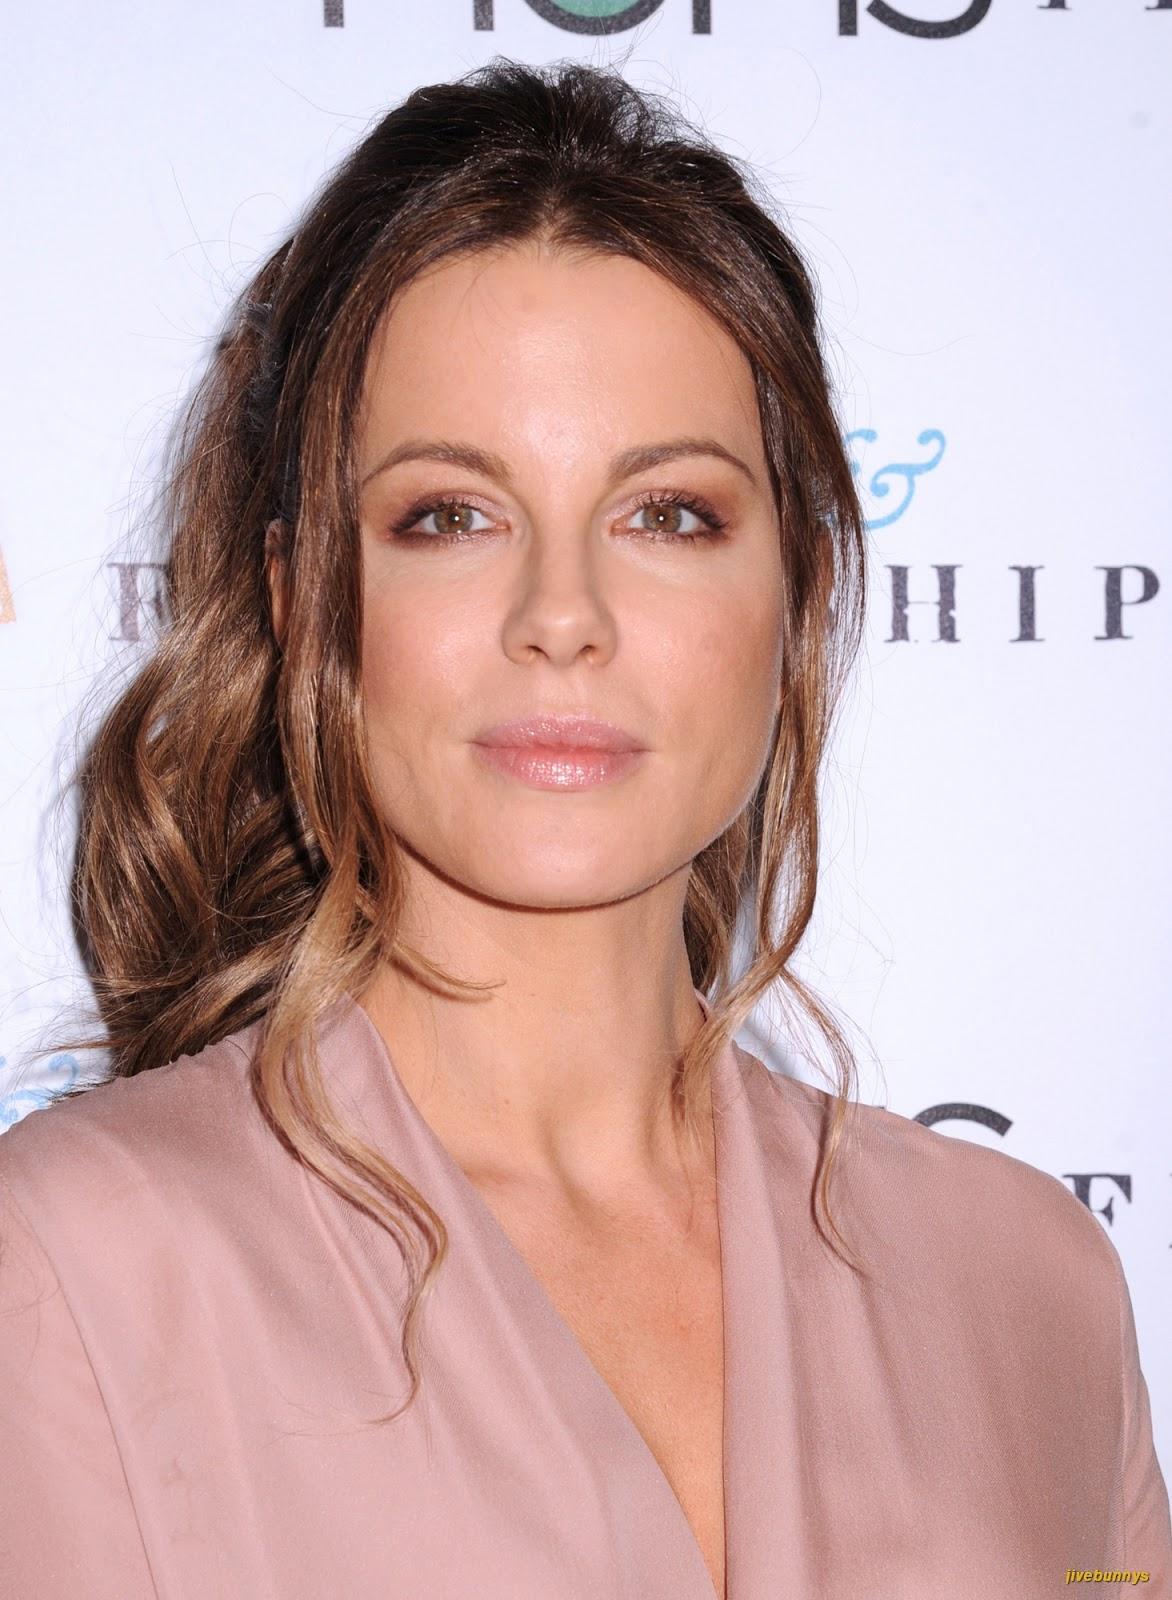 Jivebunnys Female Celebrity Picture Gallery: Kate ... Kate Beckinsale Movies